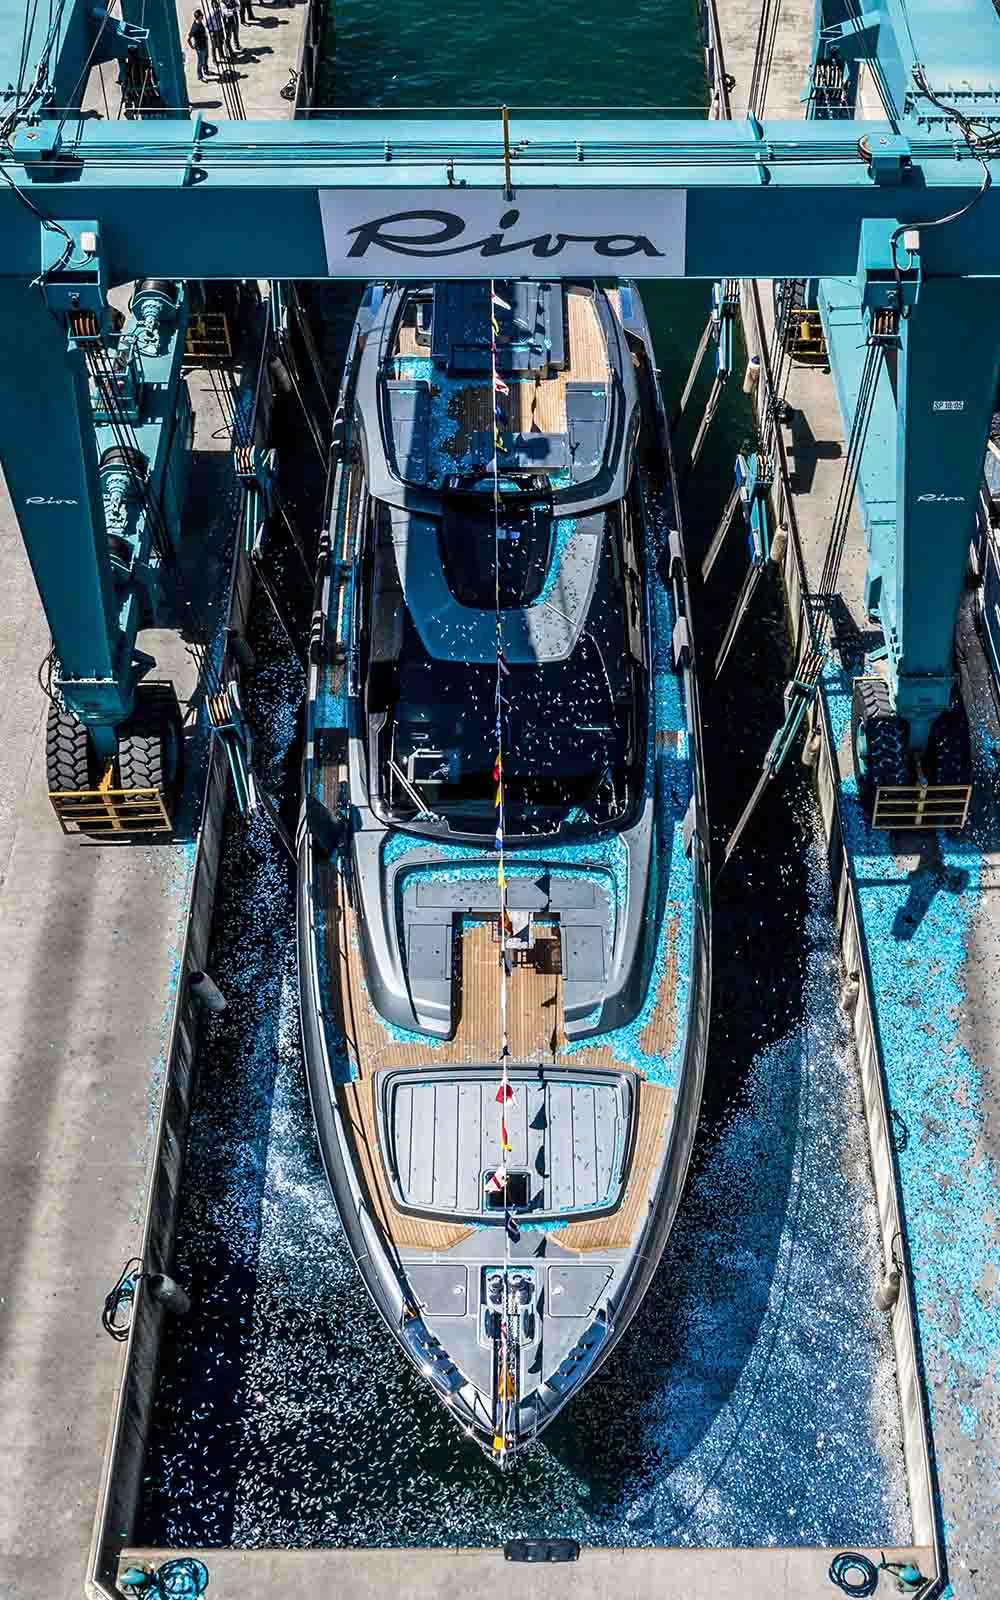 Riva 88 Folgore - boat shopping